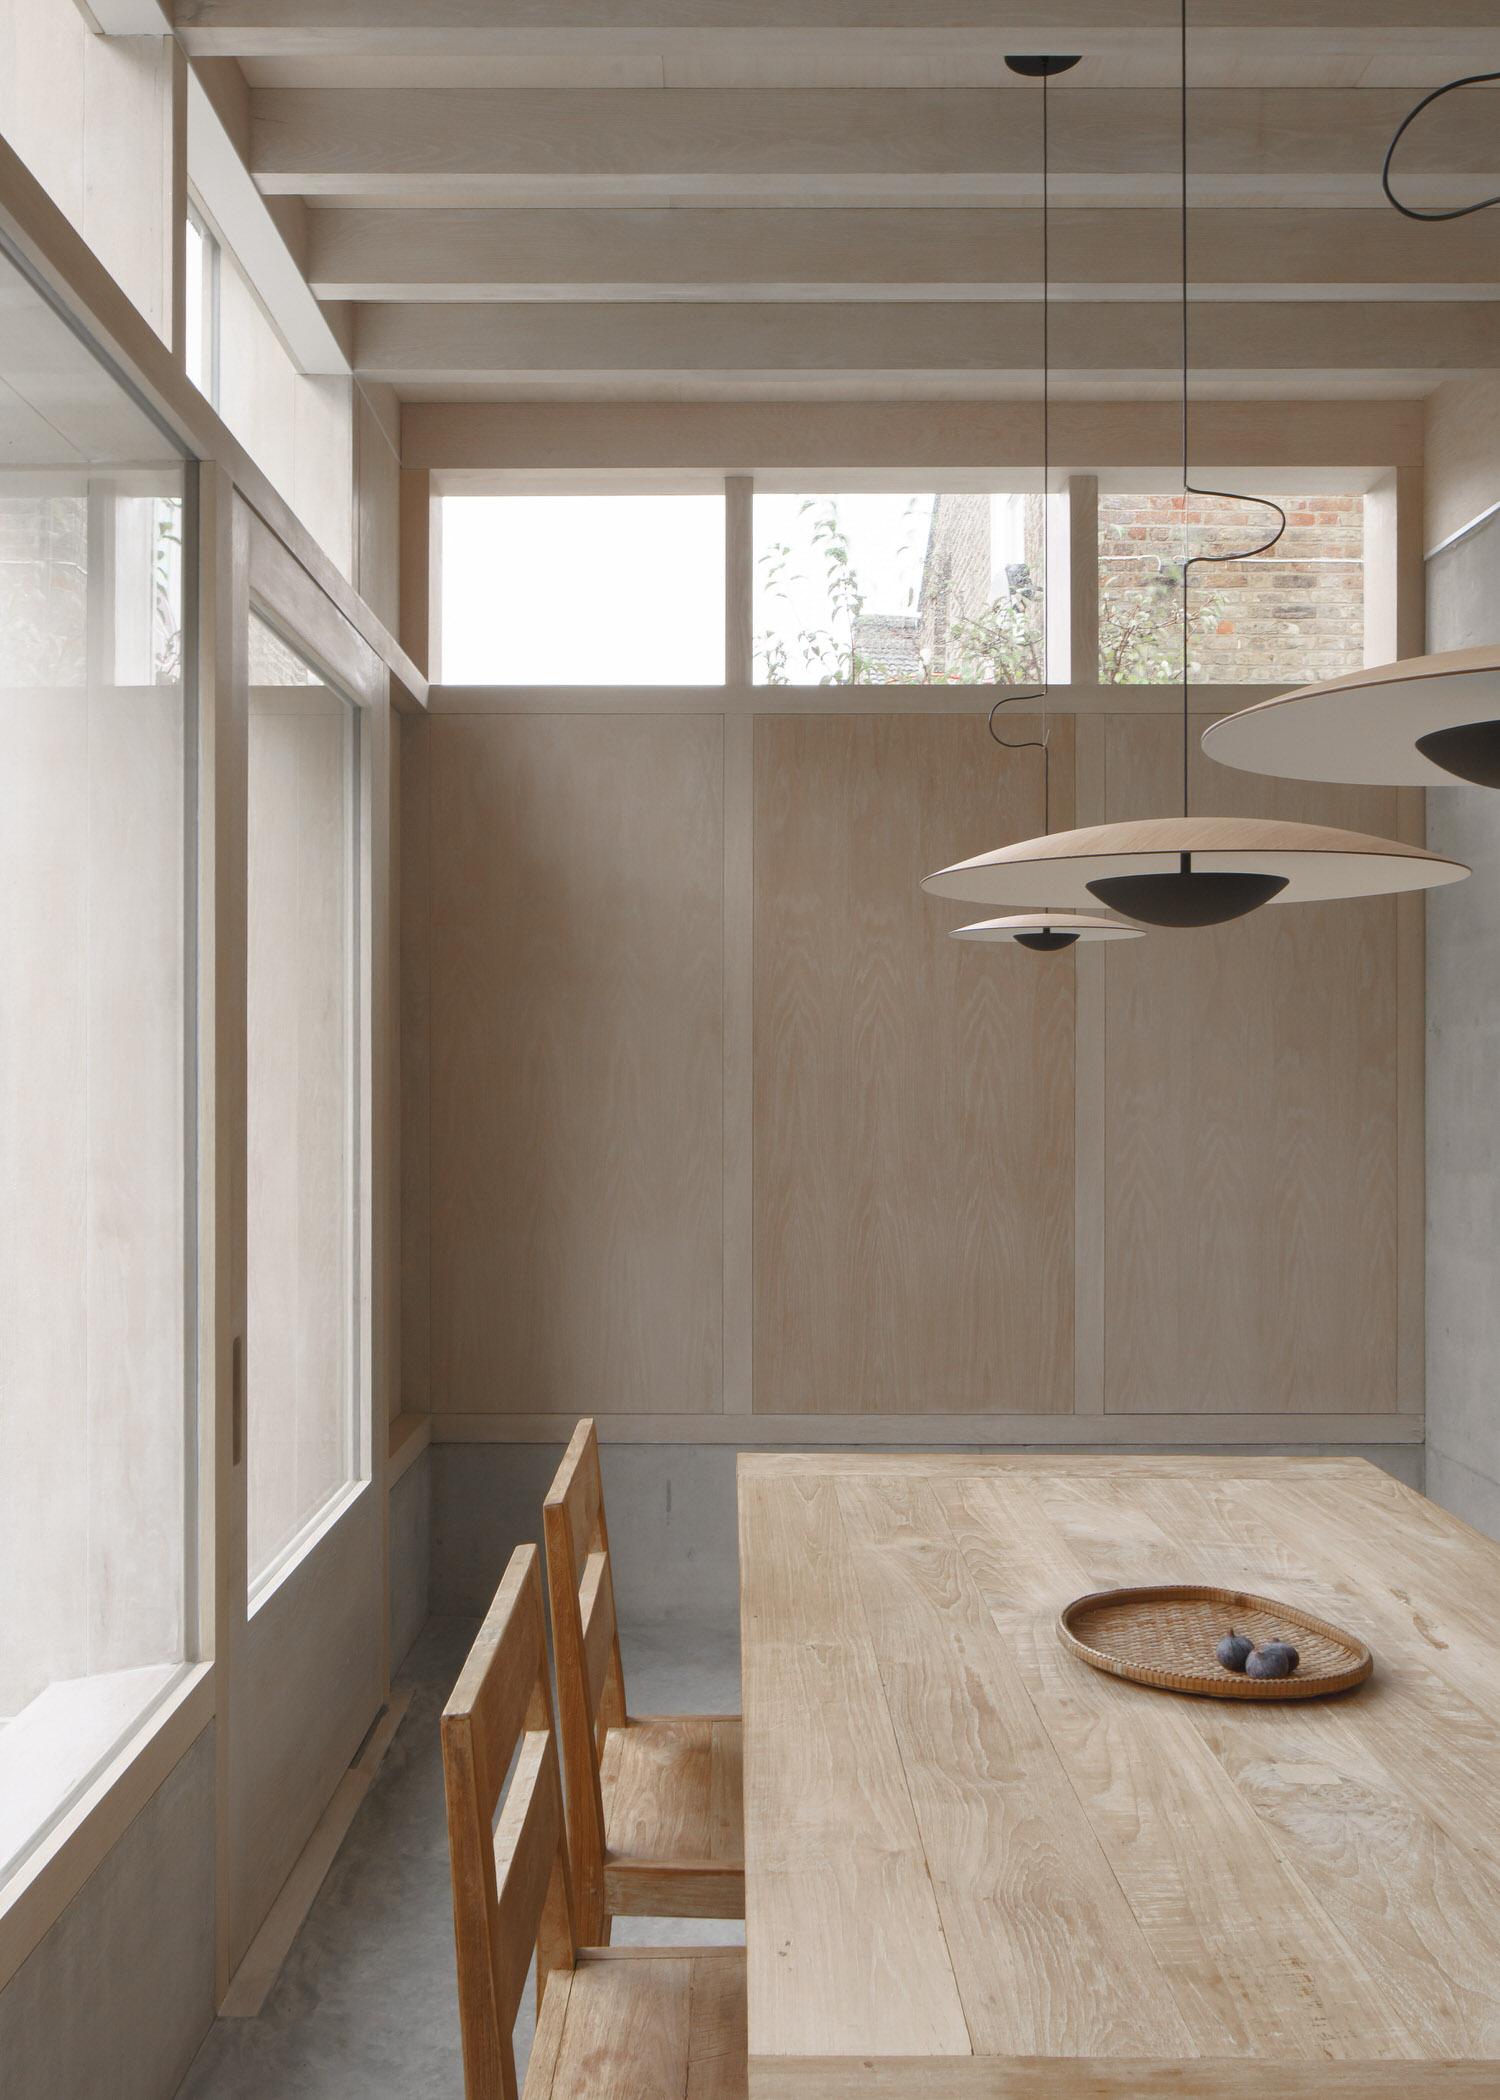 Dgn Studio Concrete Plinth House East London Residential Architecture Photo Nick Dearden Yellowtrace 07